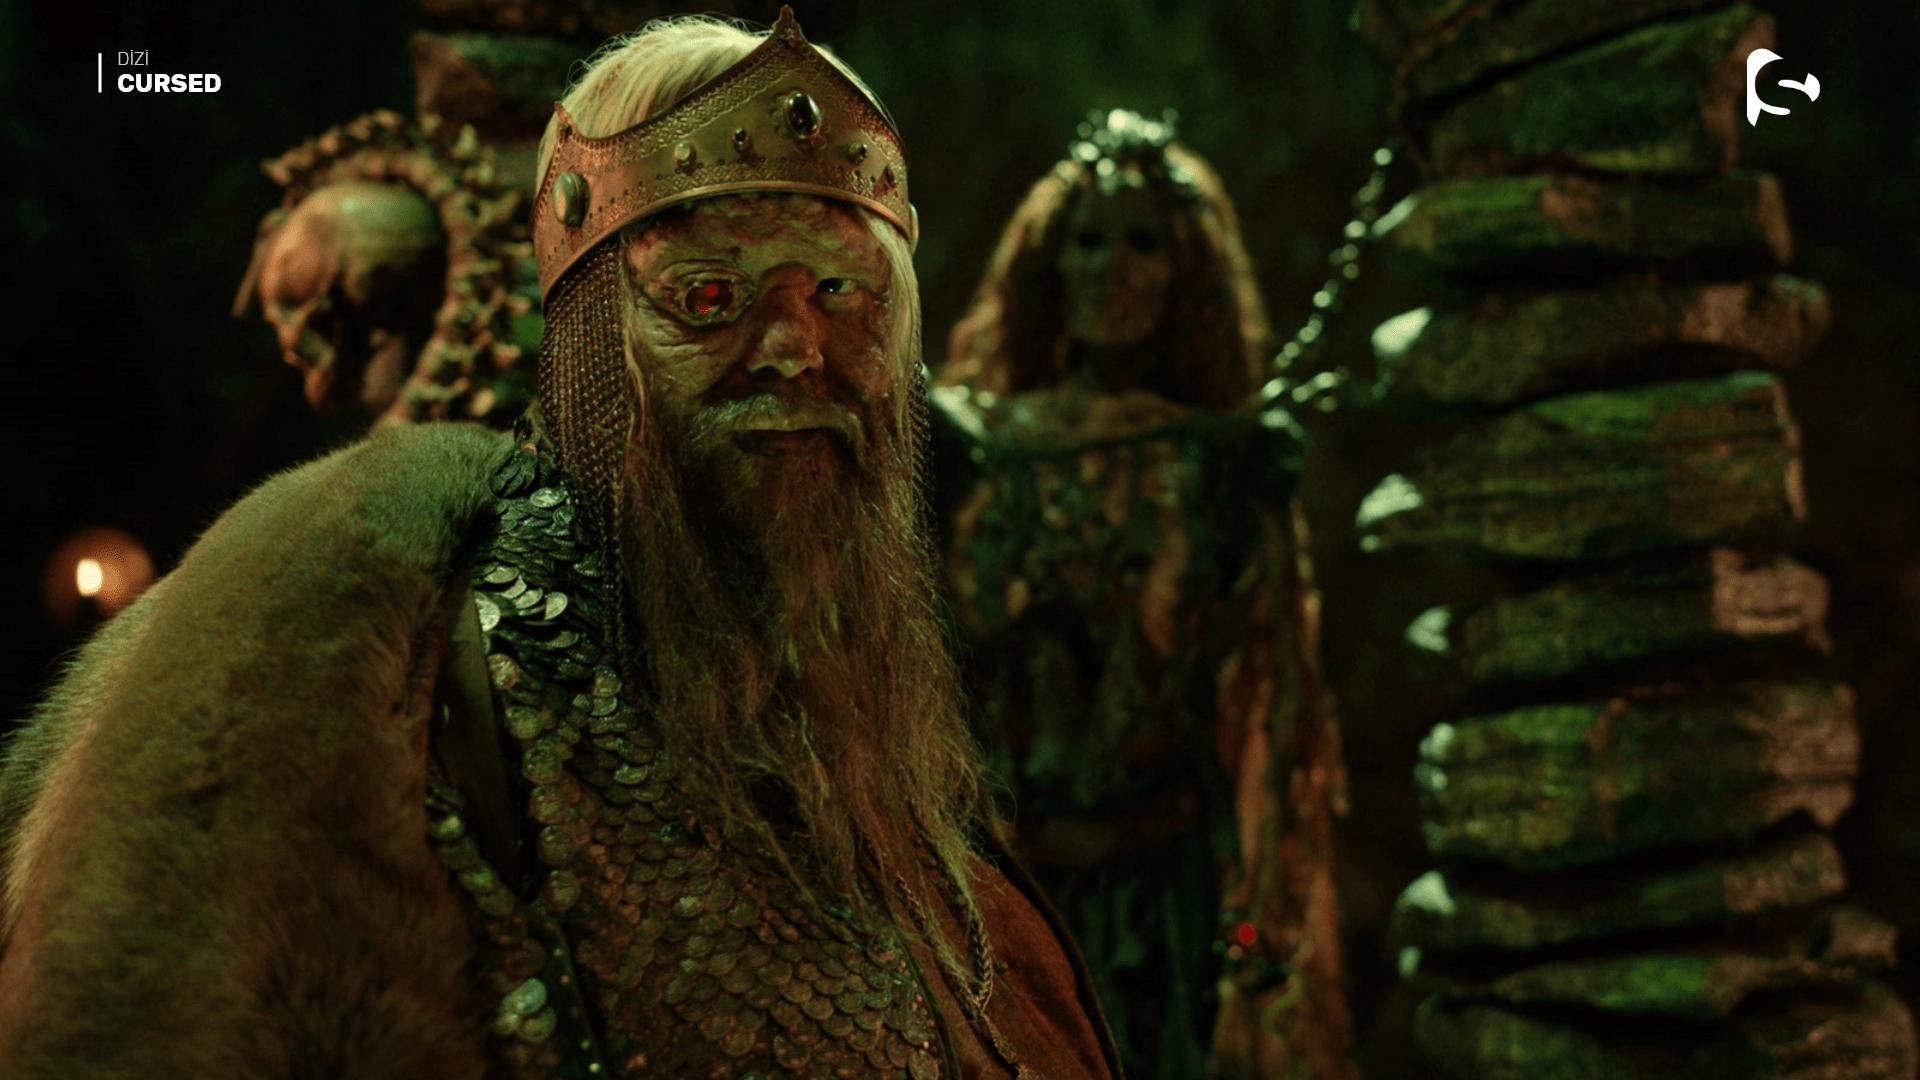 Rugen the Leper King - Olafur Darri Olafsson